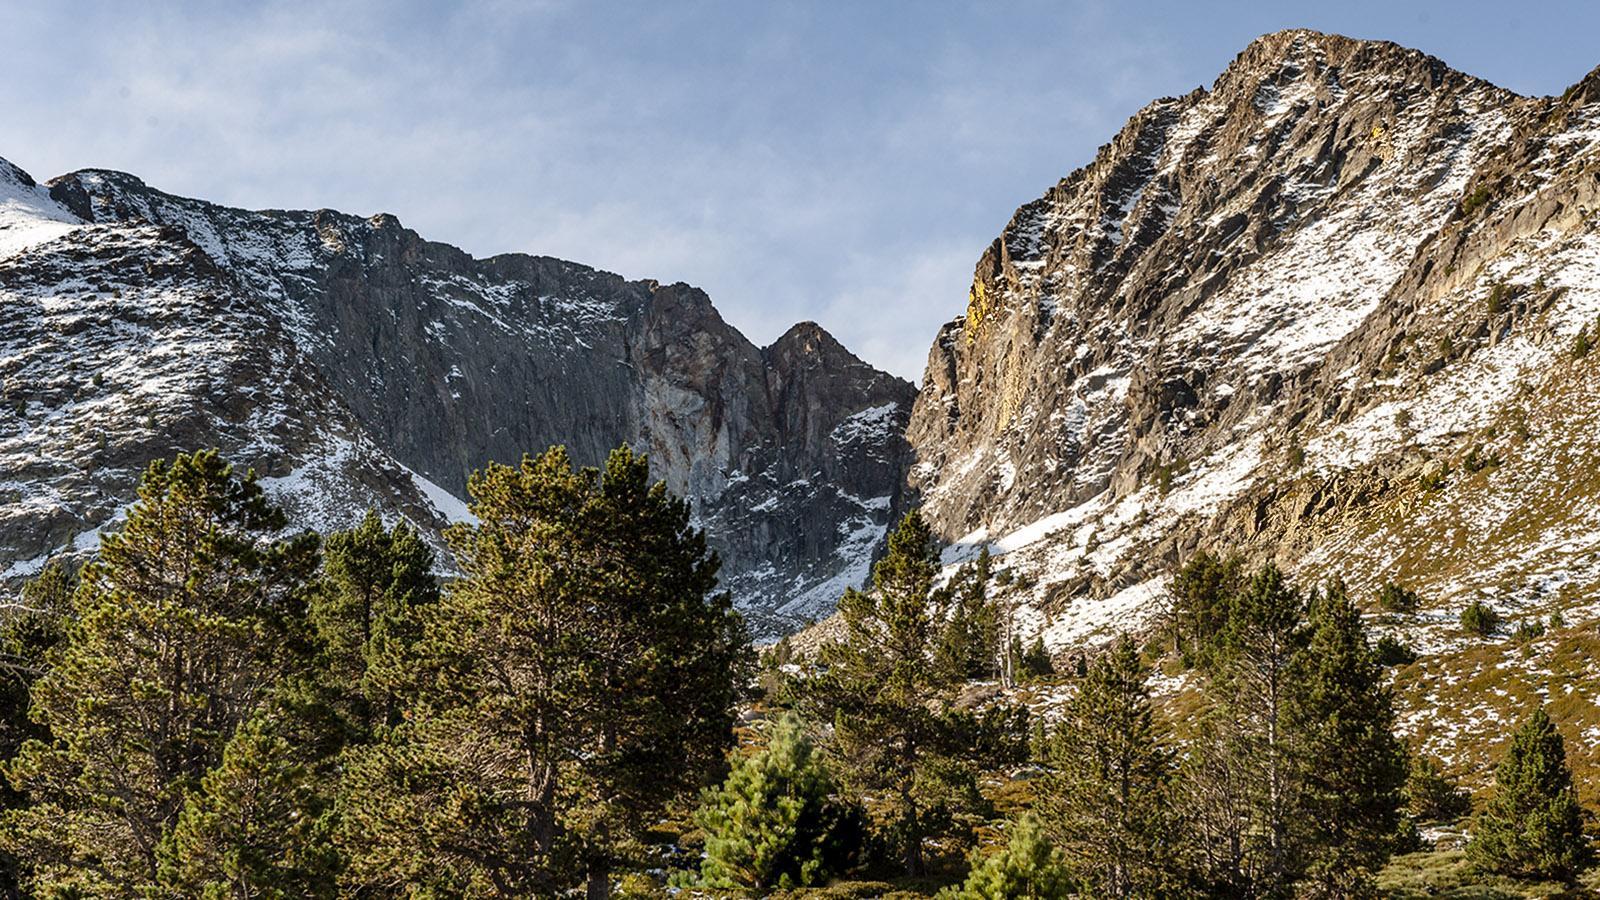 Canigó: Blick auf den Gipfel von Les Cortalets. Foto: Hilke Maunder